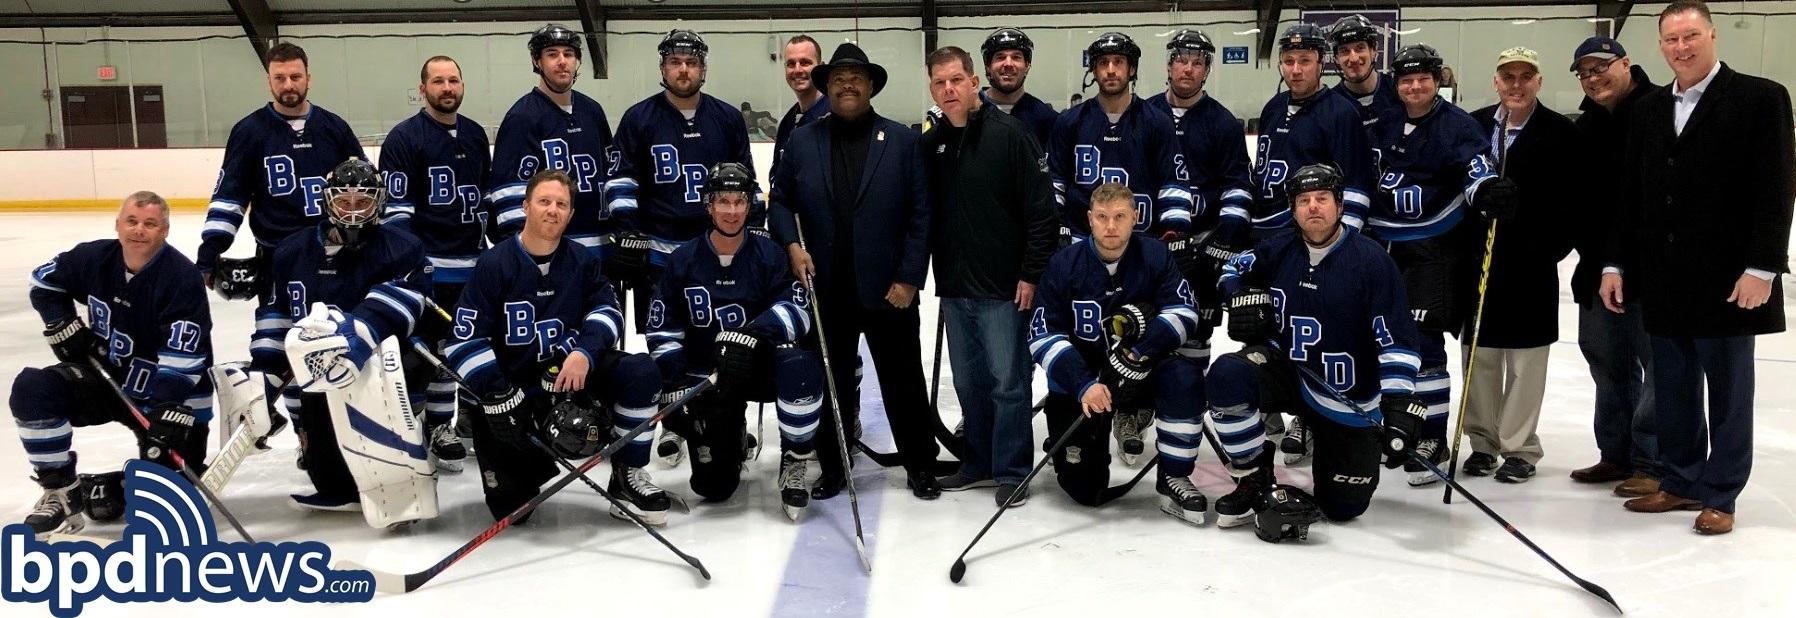 Hockey1 2.jpg